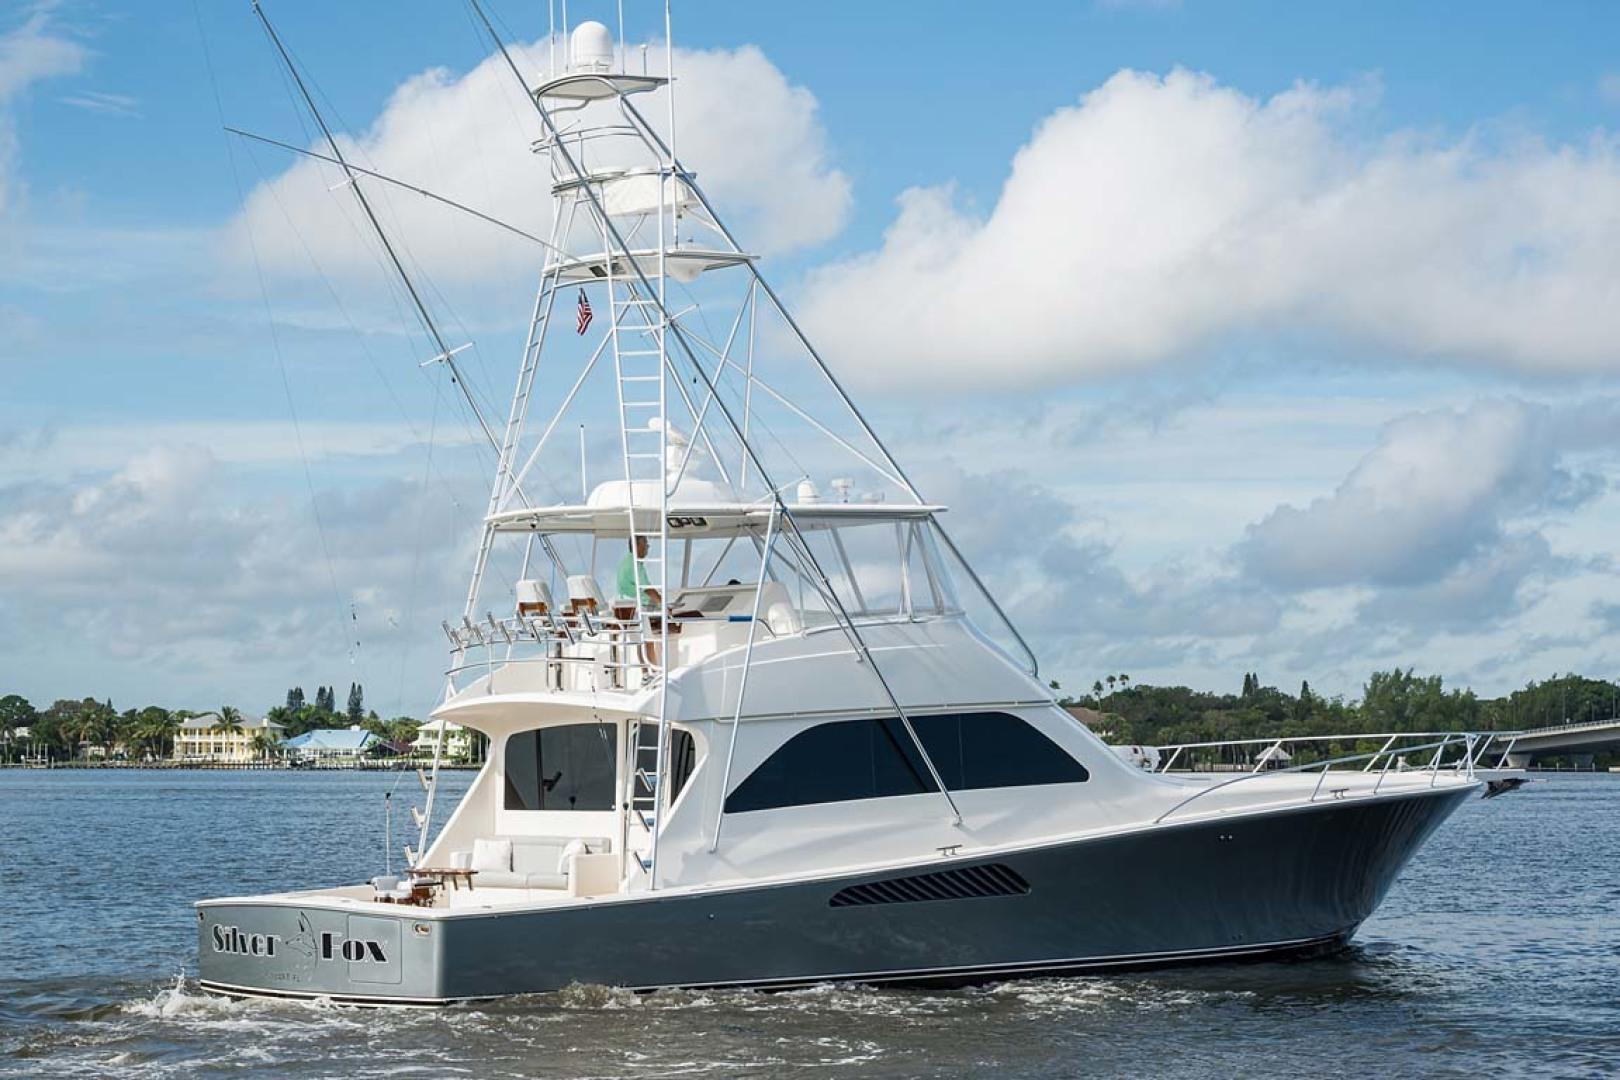 Viking-Sportfish 2007-Silver Fox Stuart-Florida-United States-Starboard View-1255897   Thumbnail